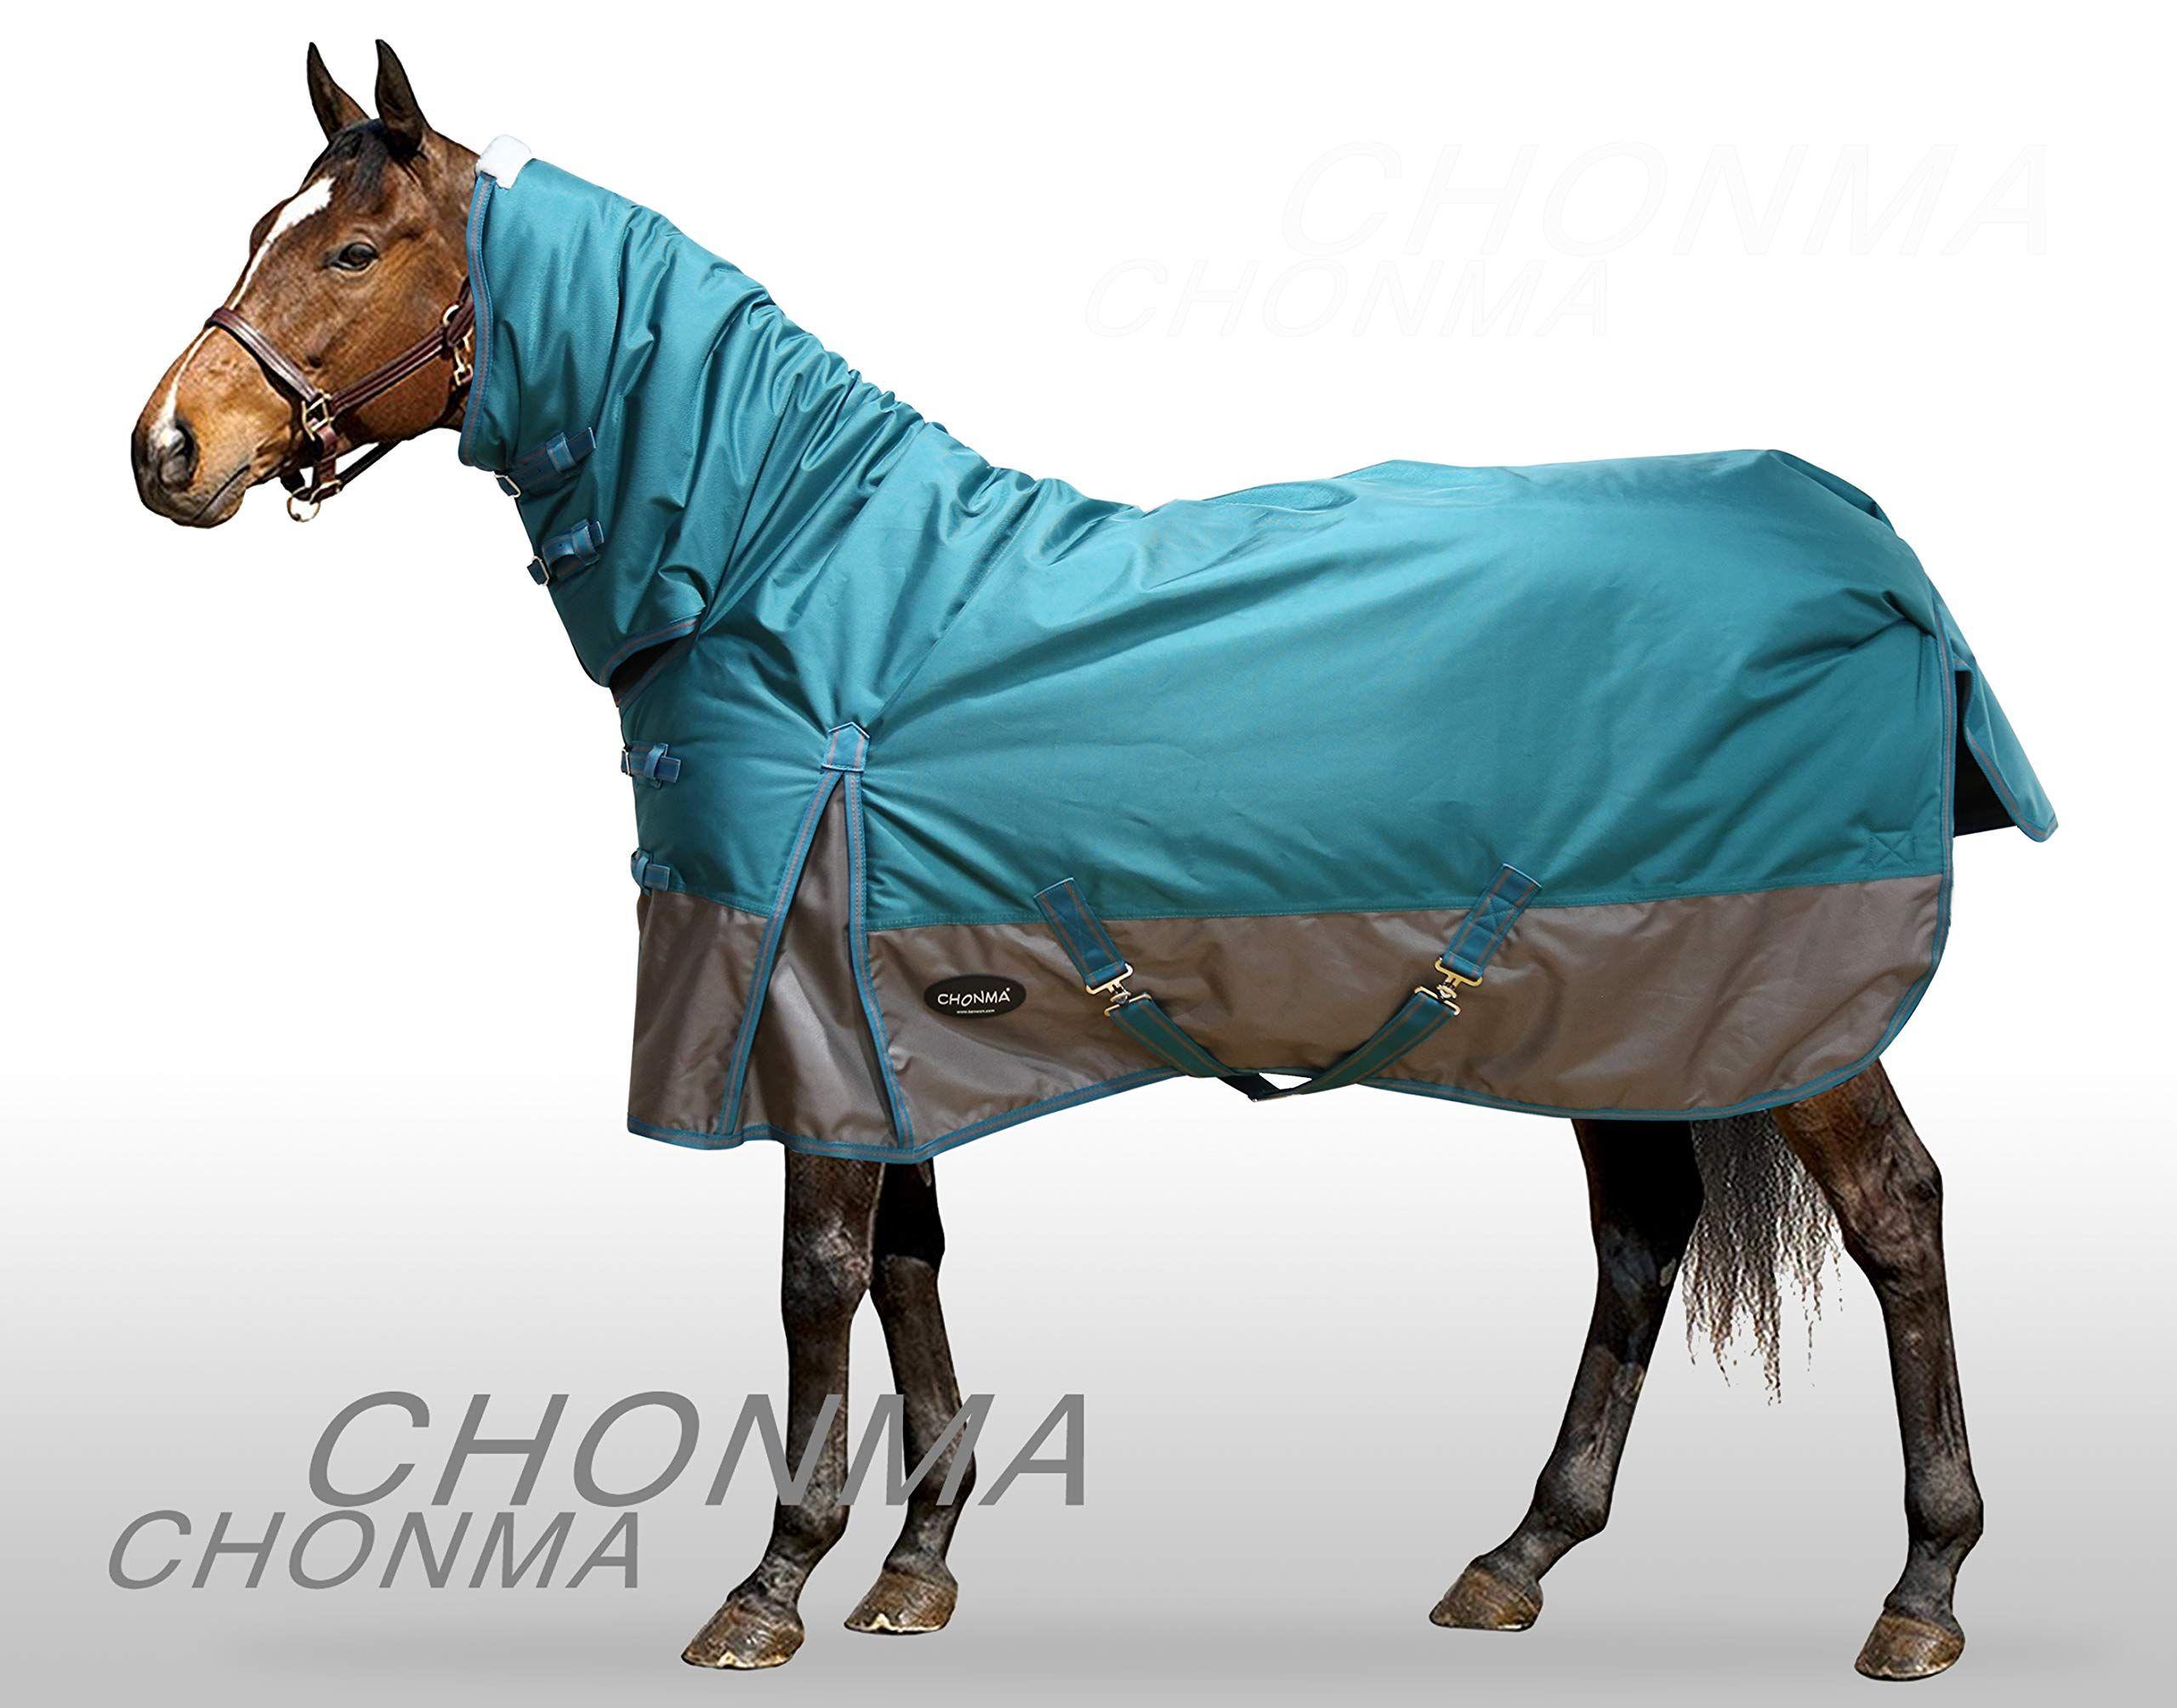 Chonma 2520d 280g Winter Waterproof Green Fixed Neck Combo